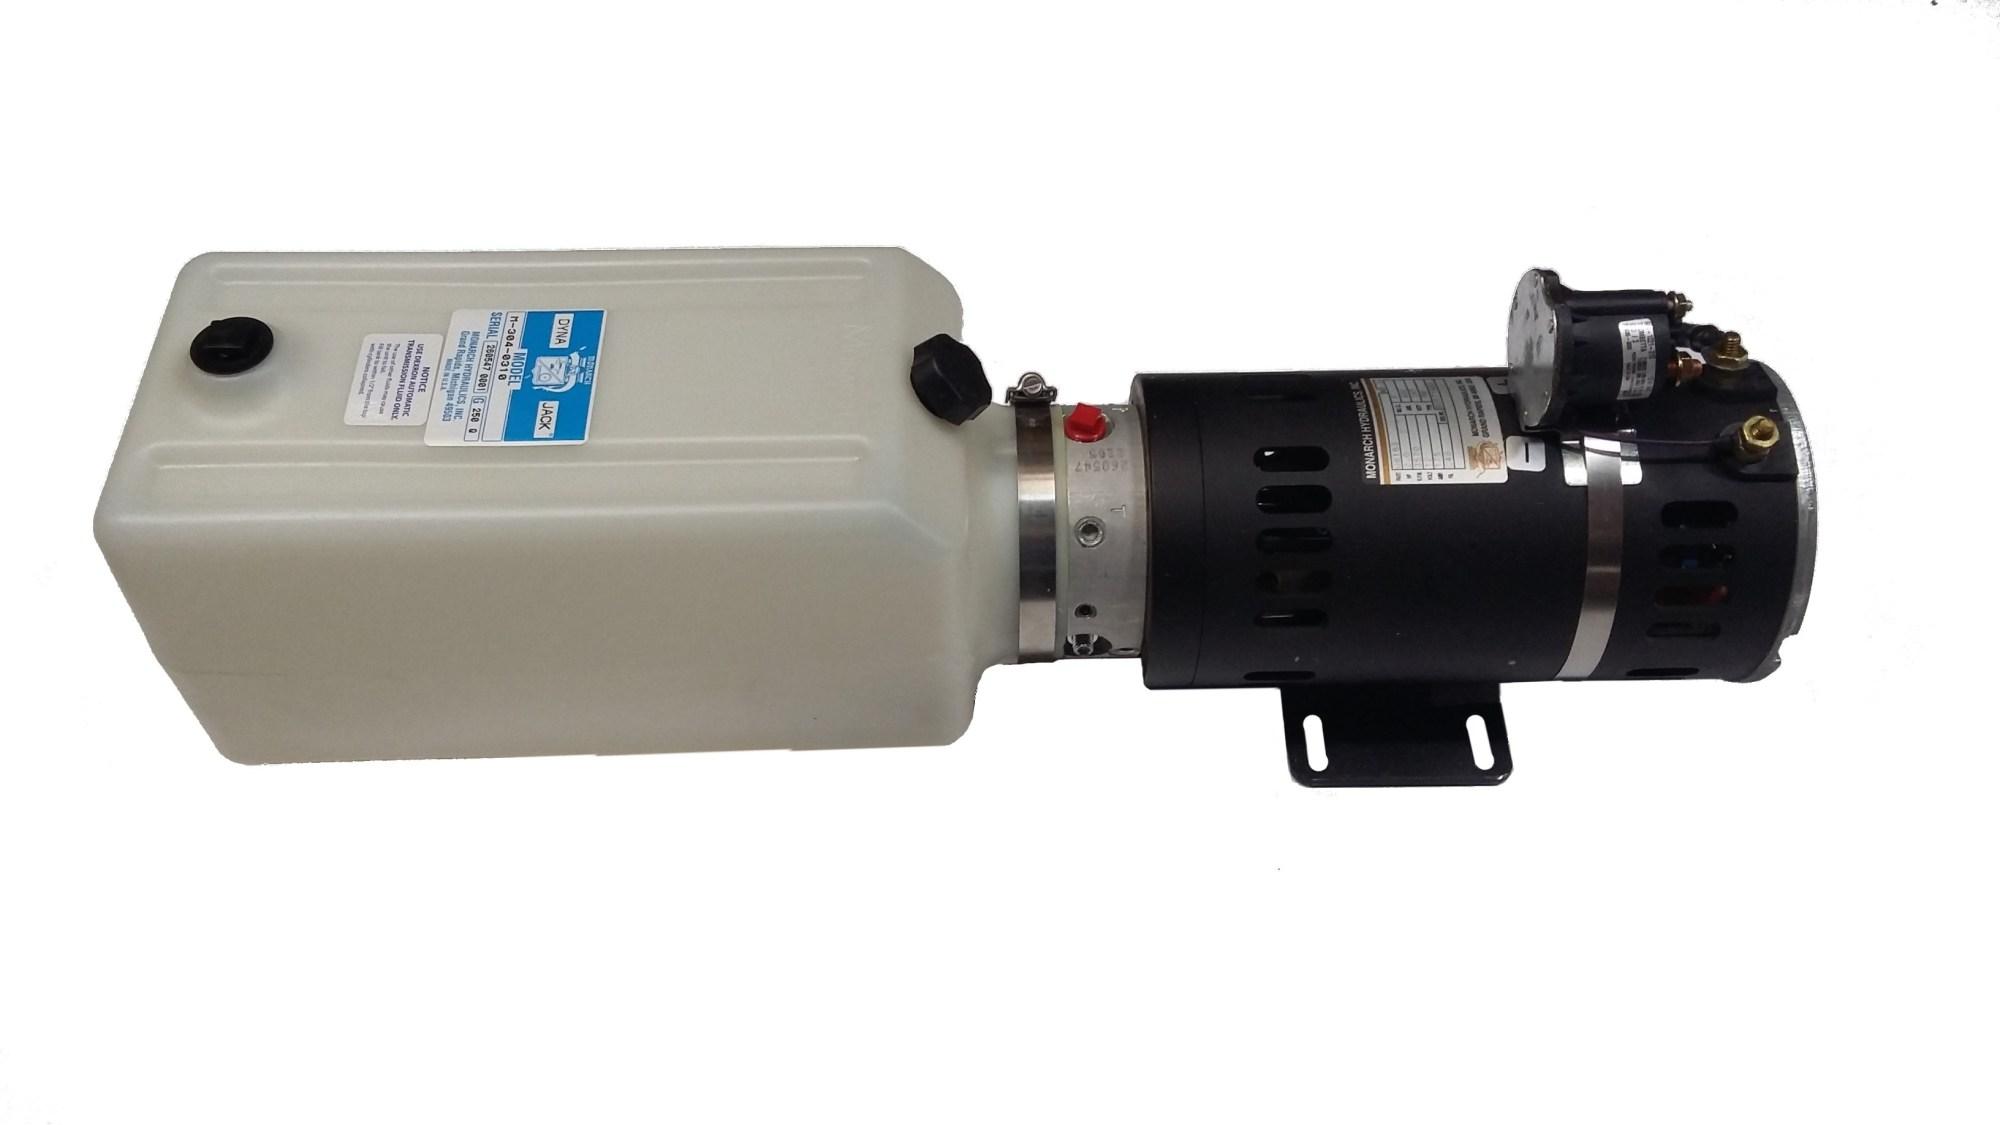 hight resolution of monarch 12 volt hydraulic pump wiring diagrammonarch 12 volt hydraulic pump wiring diagram monarch hydraulic pump